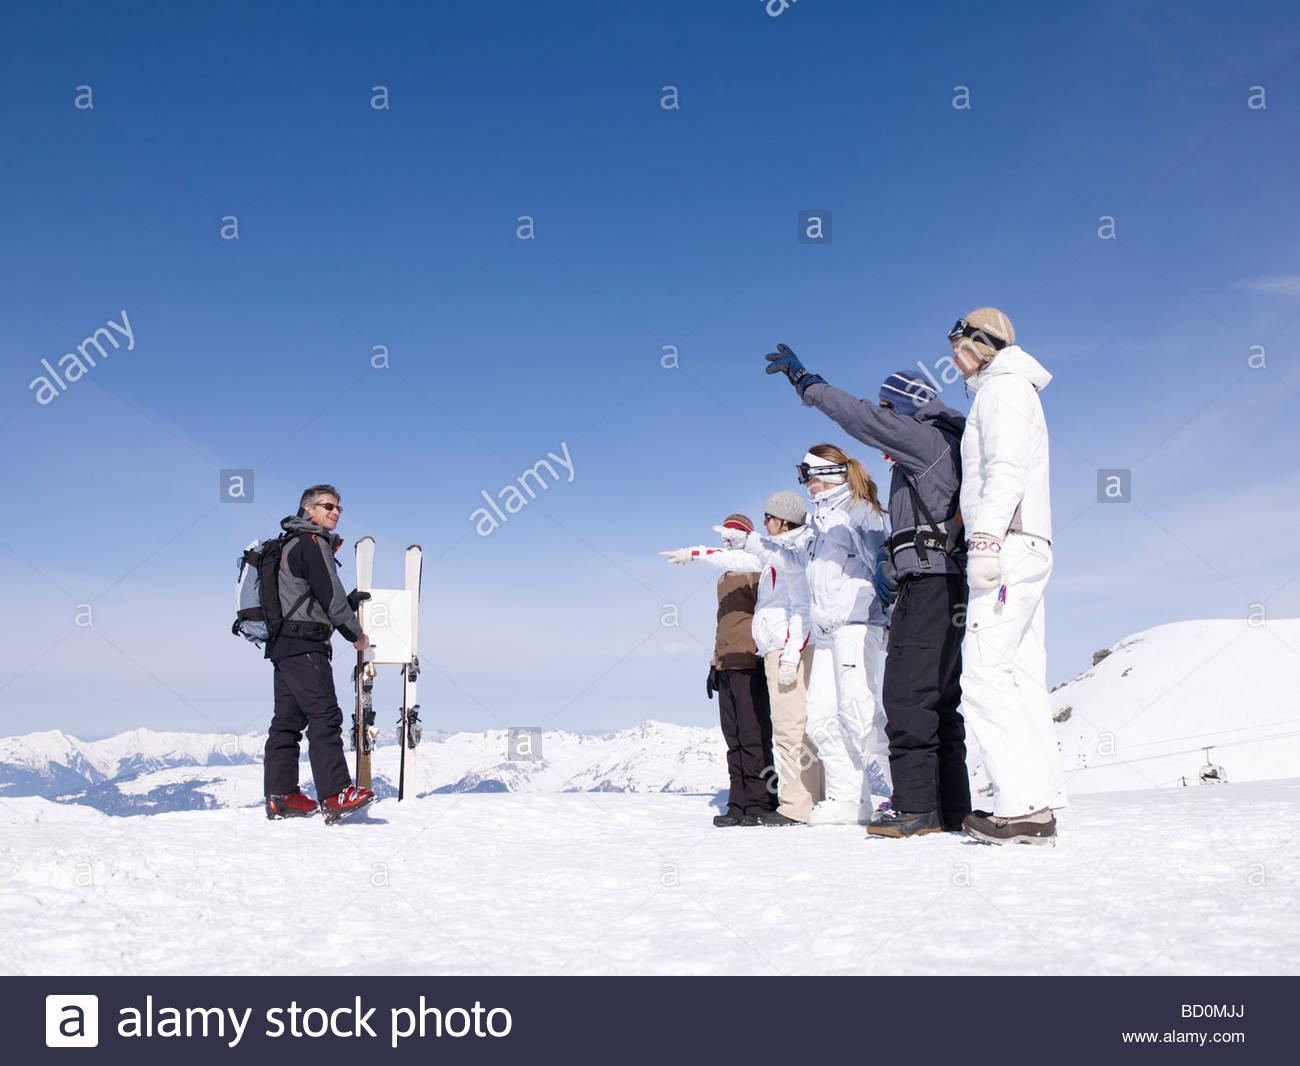 ski instructor teaching class - Stock Image